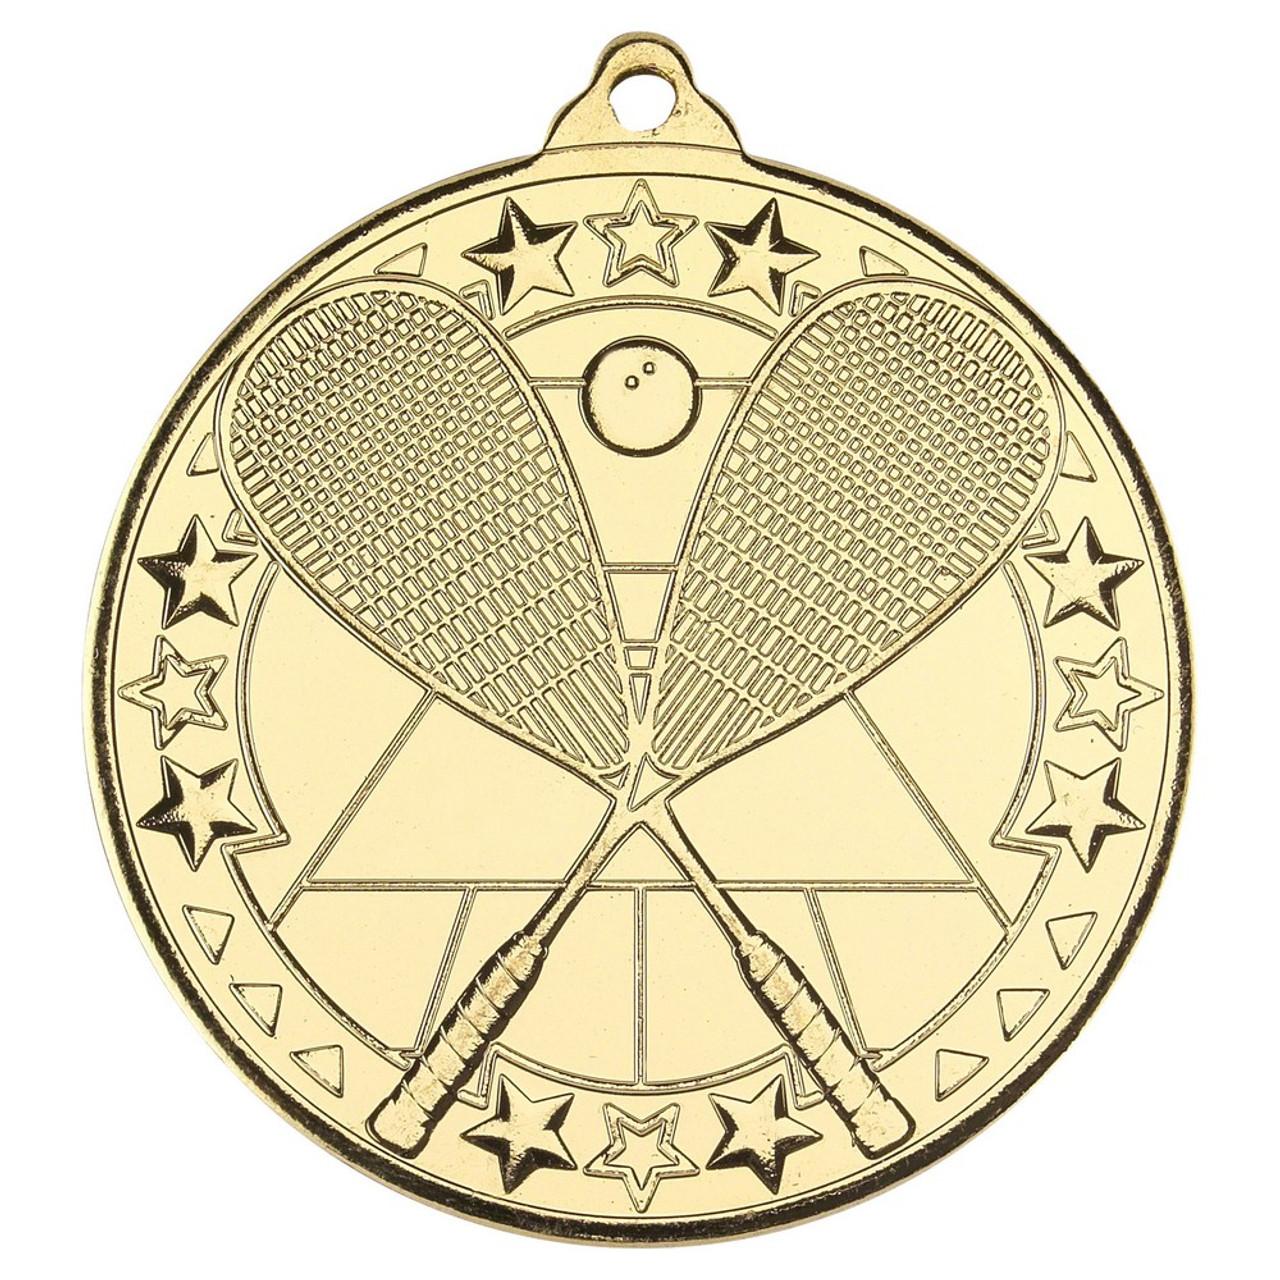 50mm Gold Squash medal